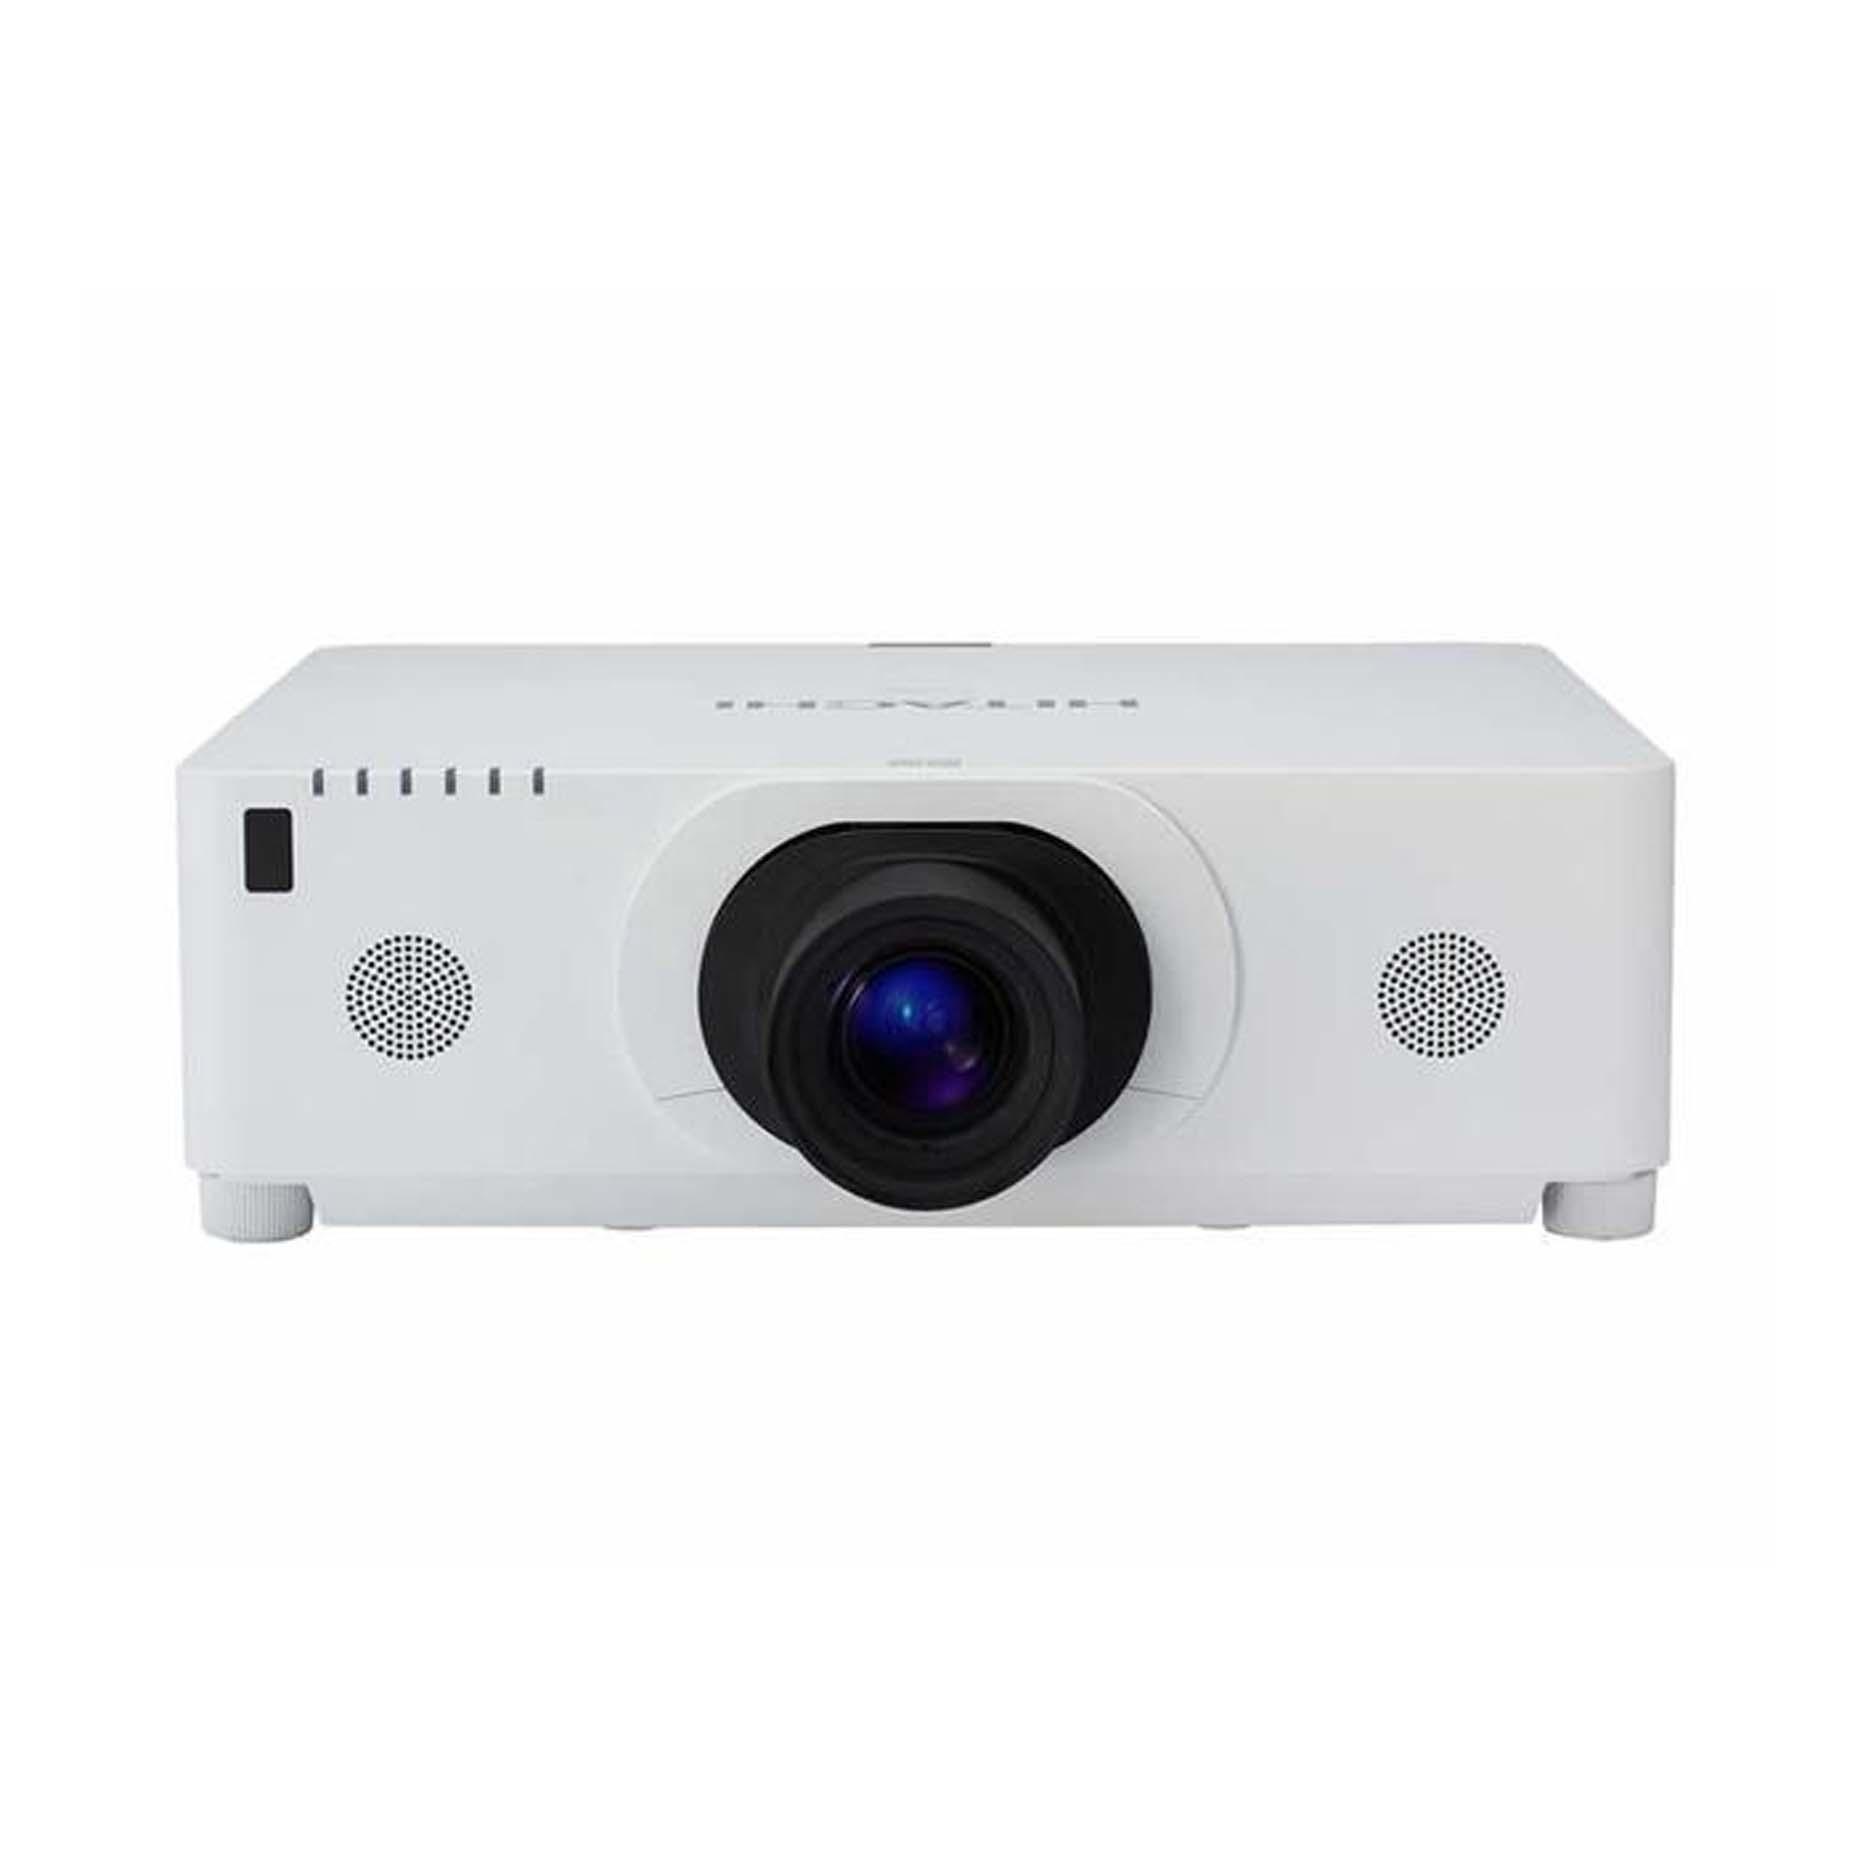 Harga Hitachi CP-WU8700W Professional 3 LCD Projector WUXGA 7000 Ansi Lumens